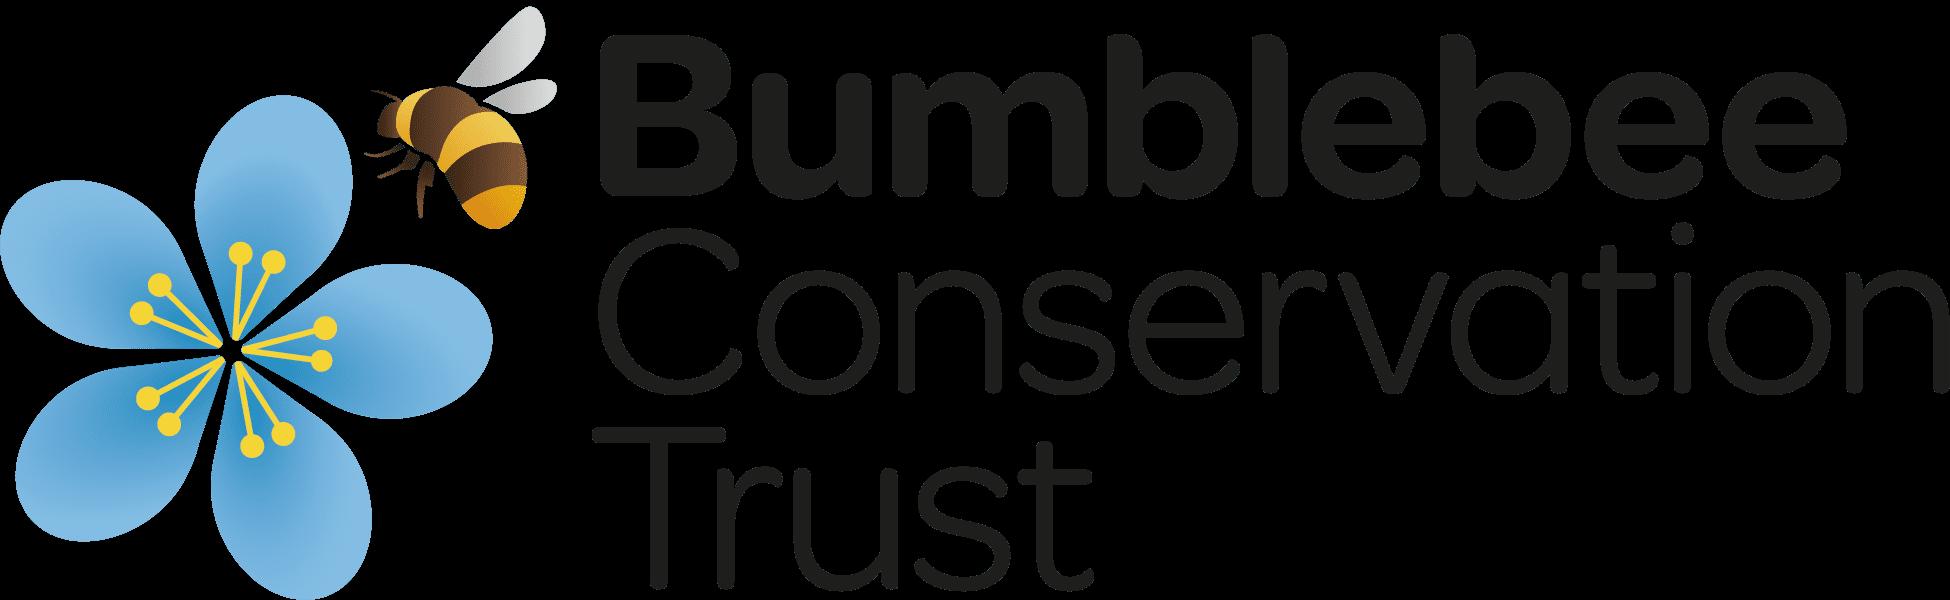 Bumblebee Conservation Trust logo